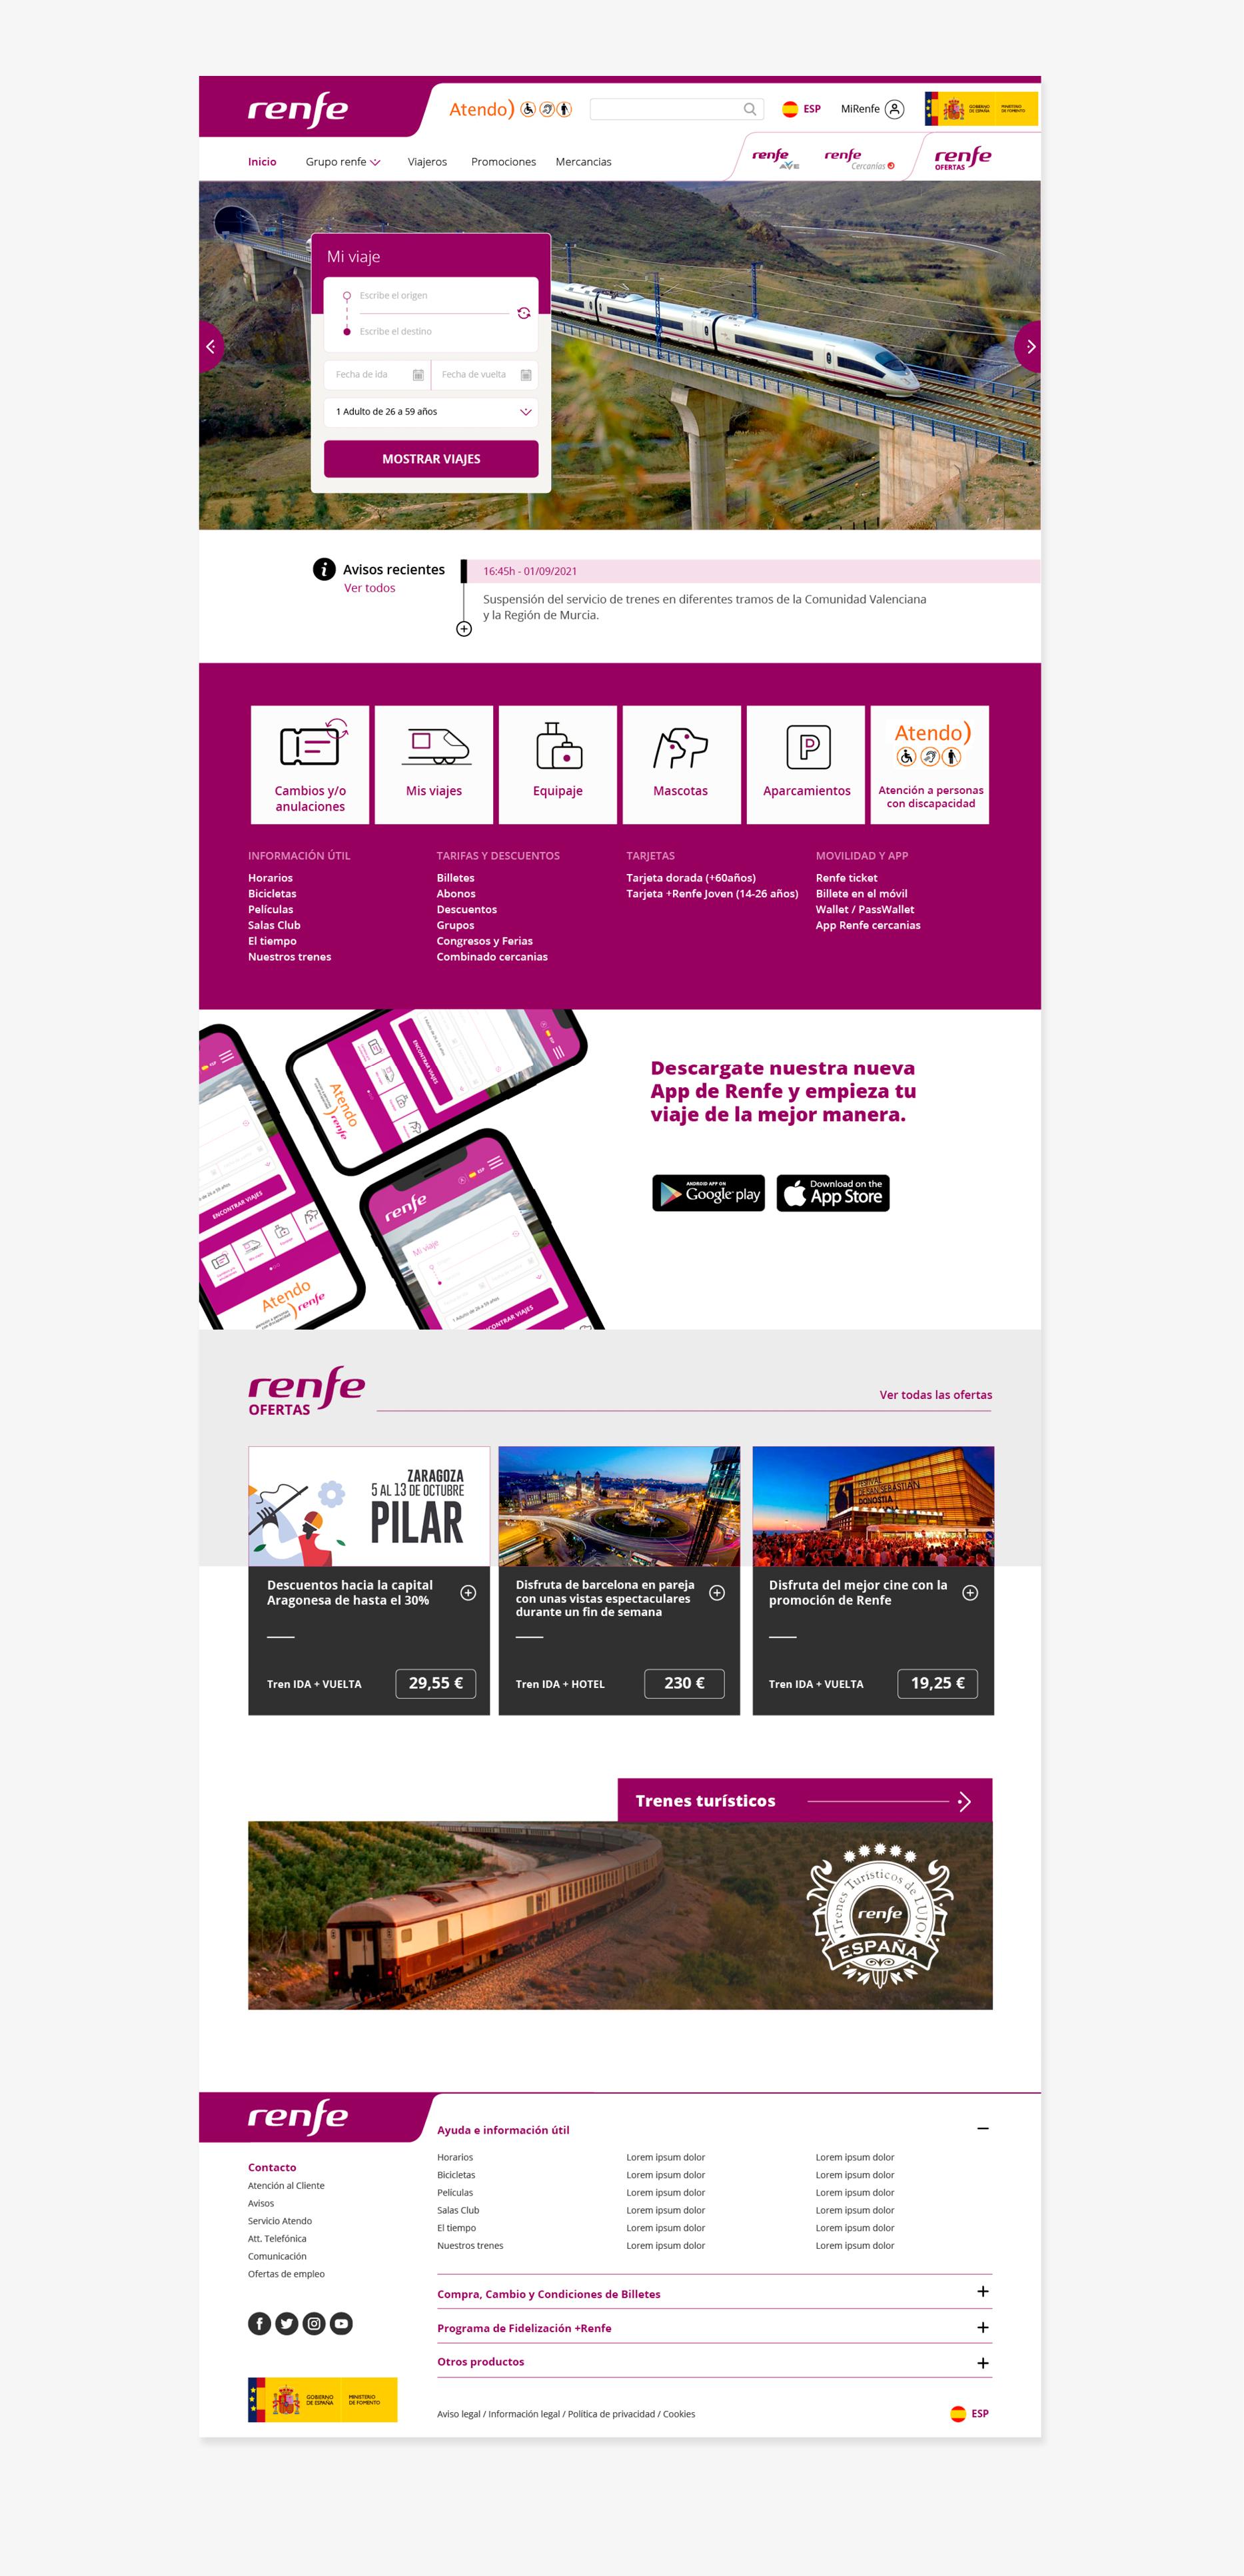 rediseño-web-renfe-diseño-nuevo-2019-20203